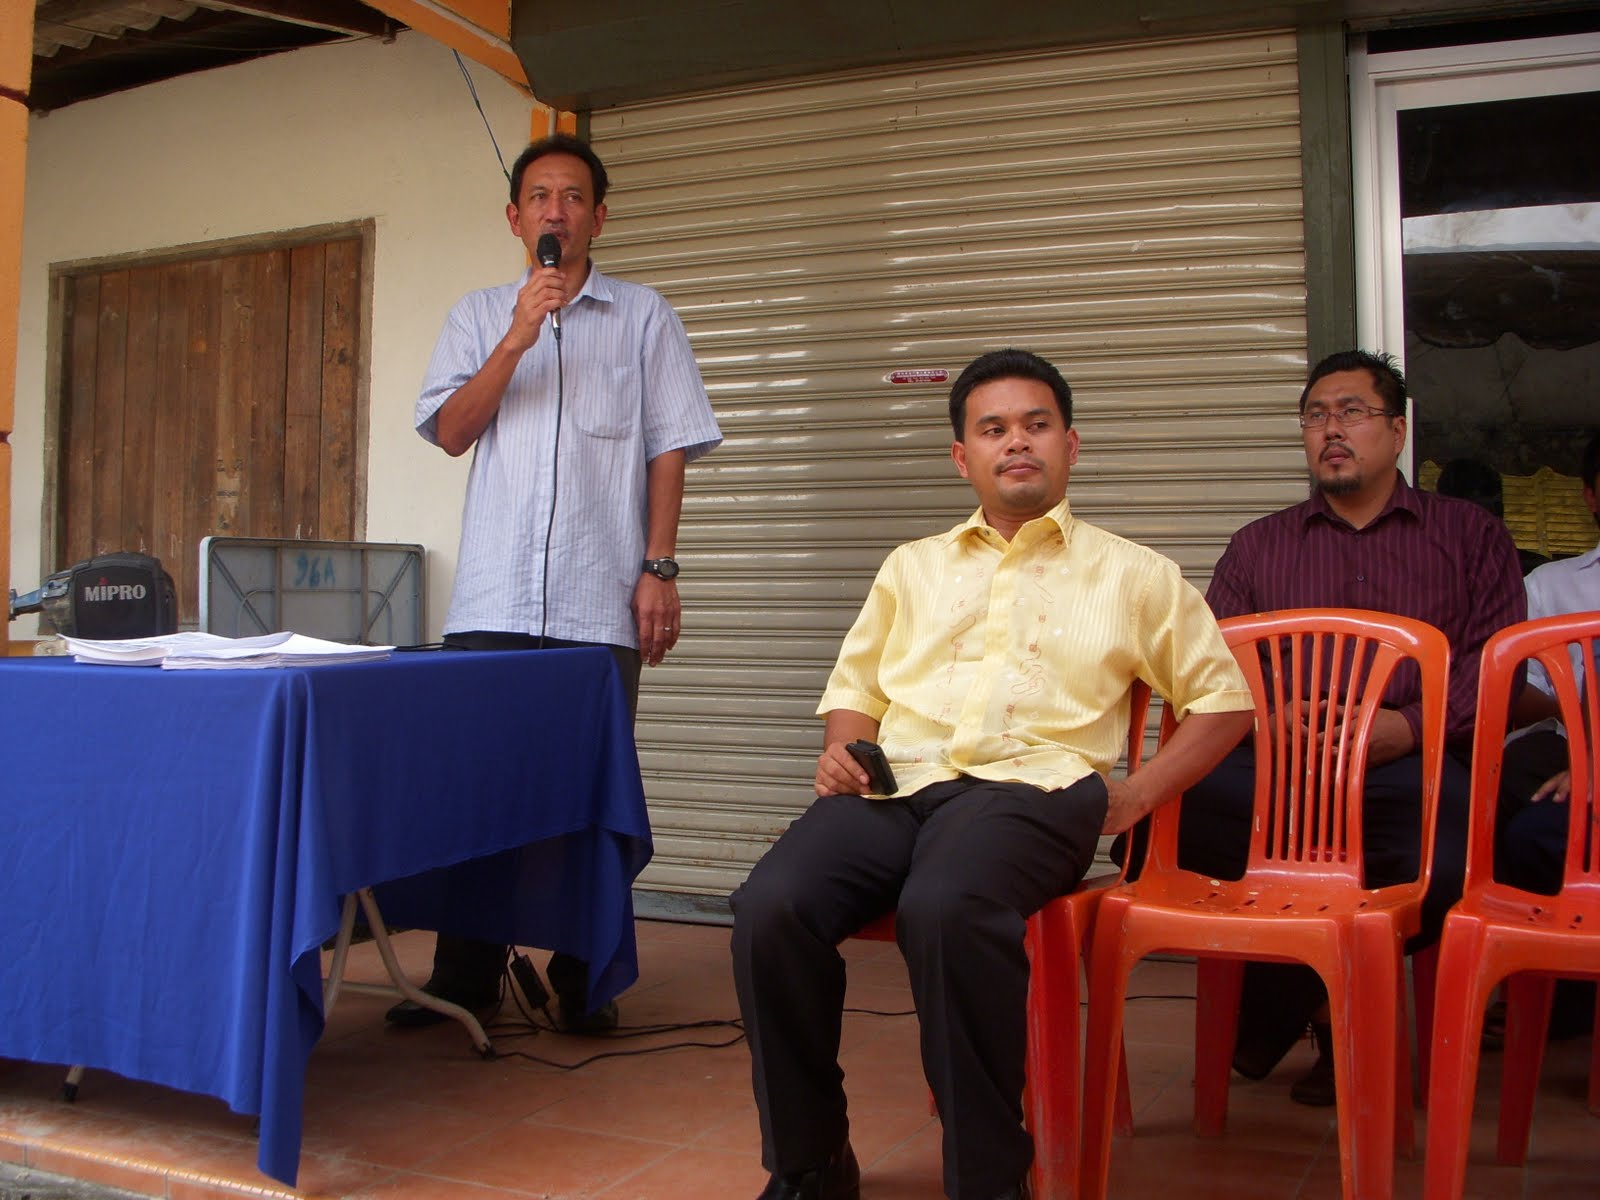 Sdr Nasar Ketua PKR Cabang Hulu Selangor memberikan pandangan beliau